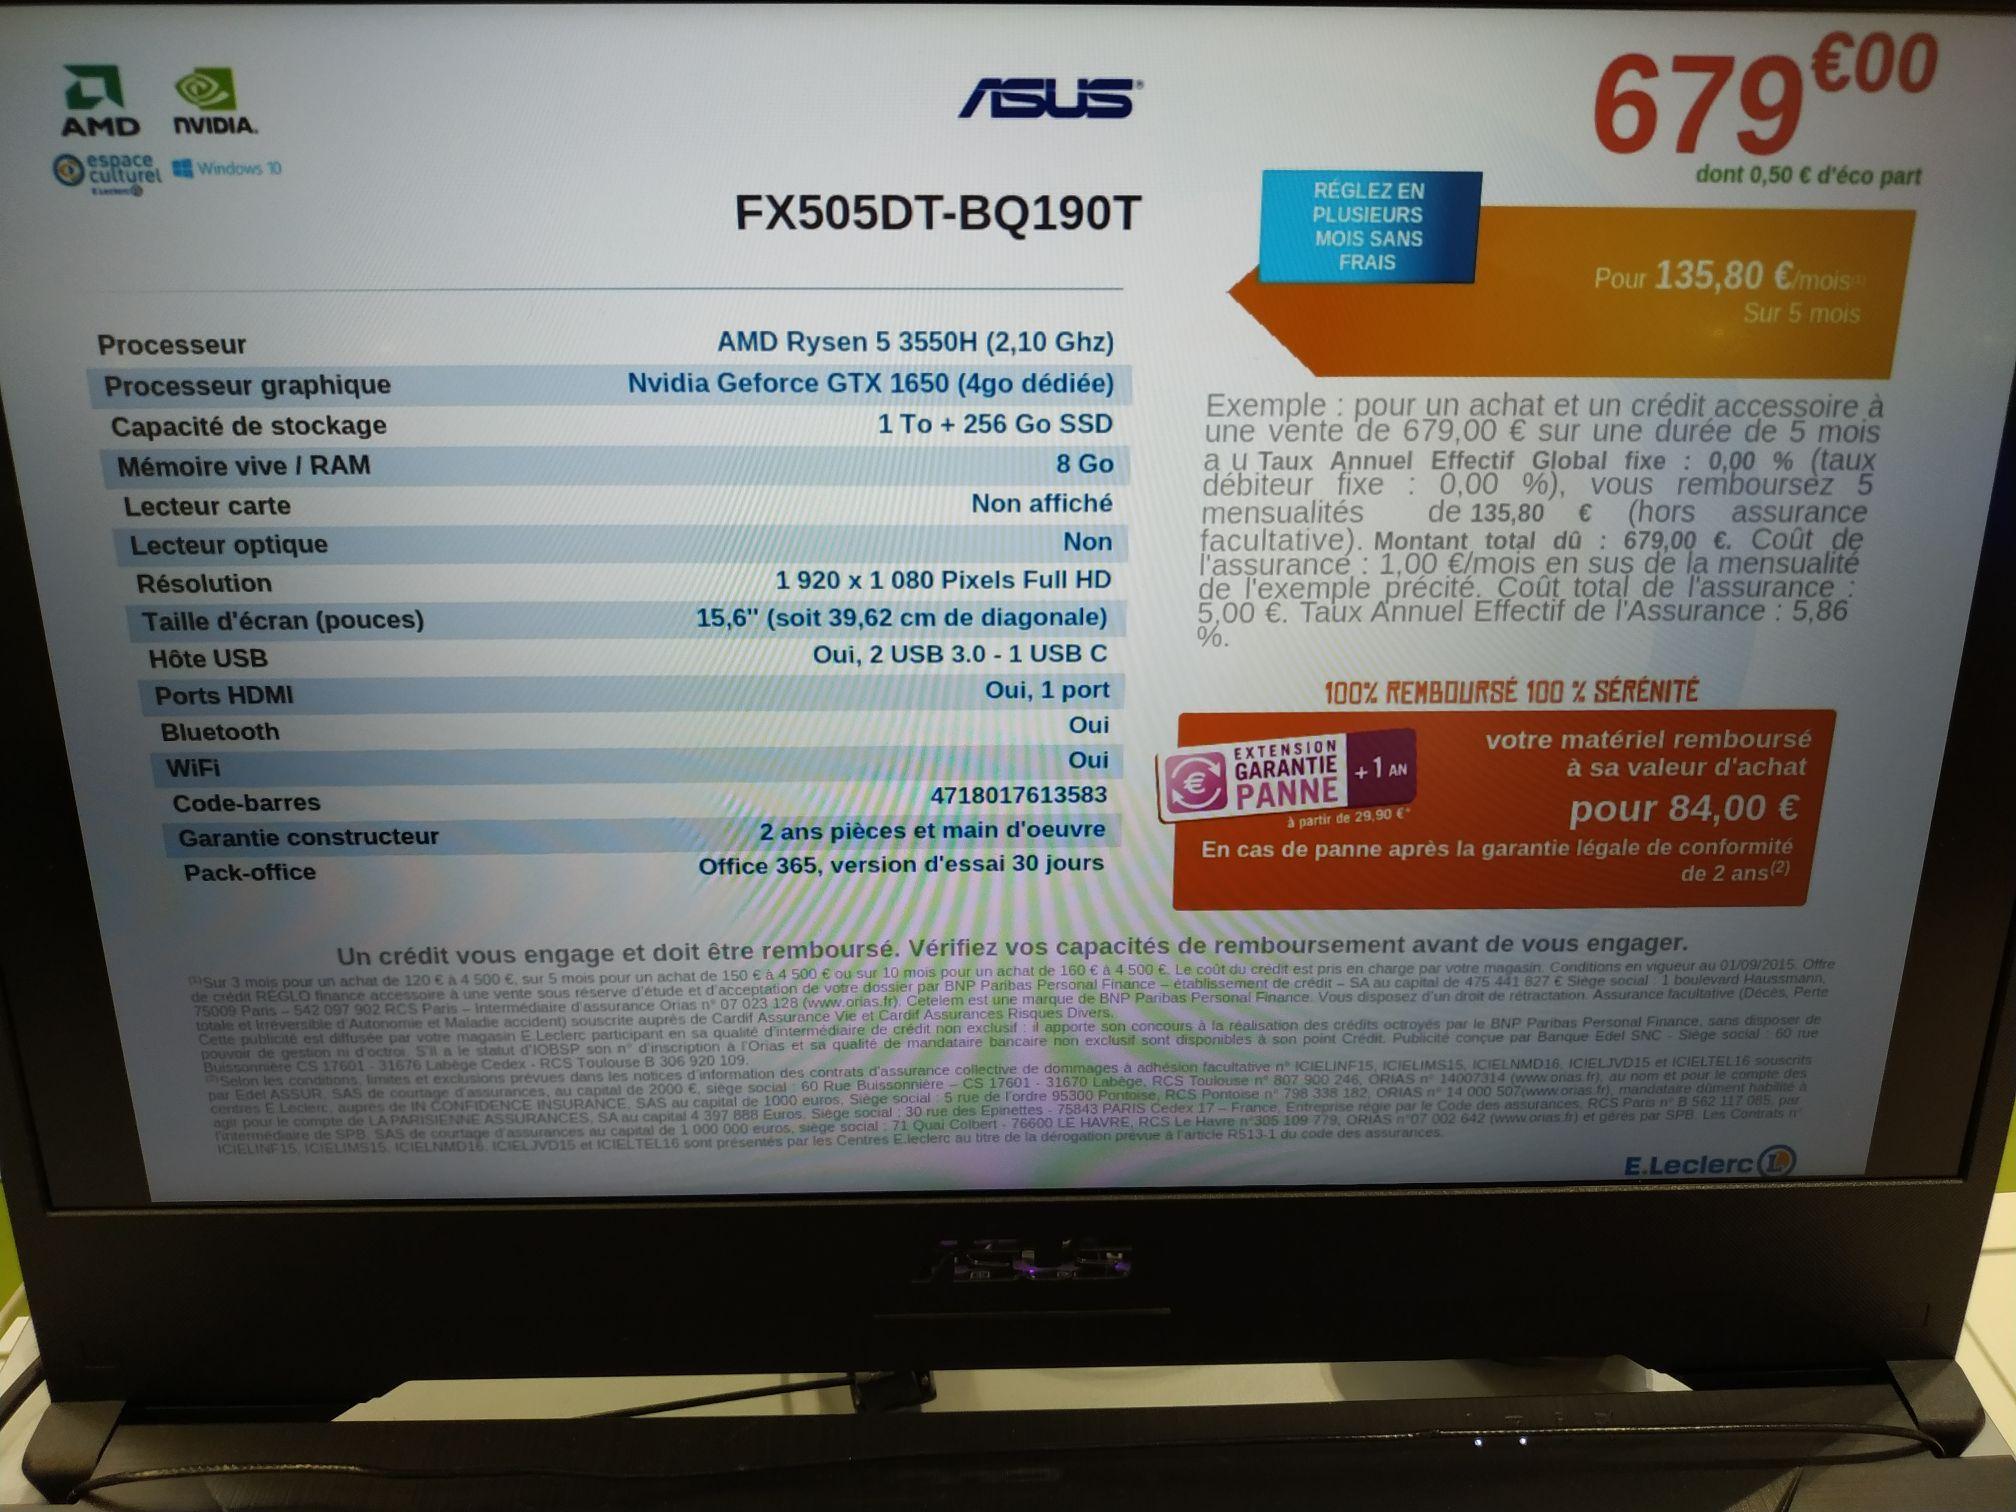 "PC Portable 15.6"" Asus FX505DT-BQ190T - Full HD, AMD Ryzen 5 3550H, 8 Go RAM, 256 Go SSD + 1 To HDD, GTX 1650, Windows 10 (Osny 95)"